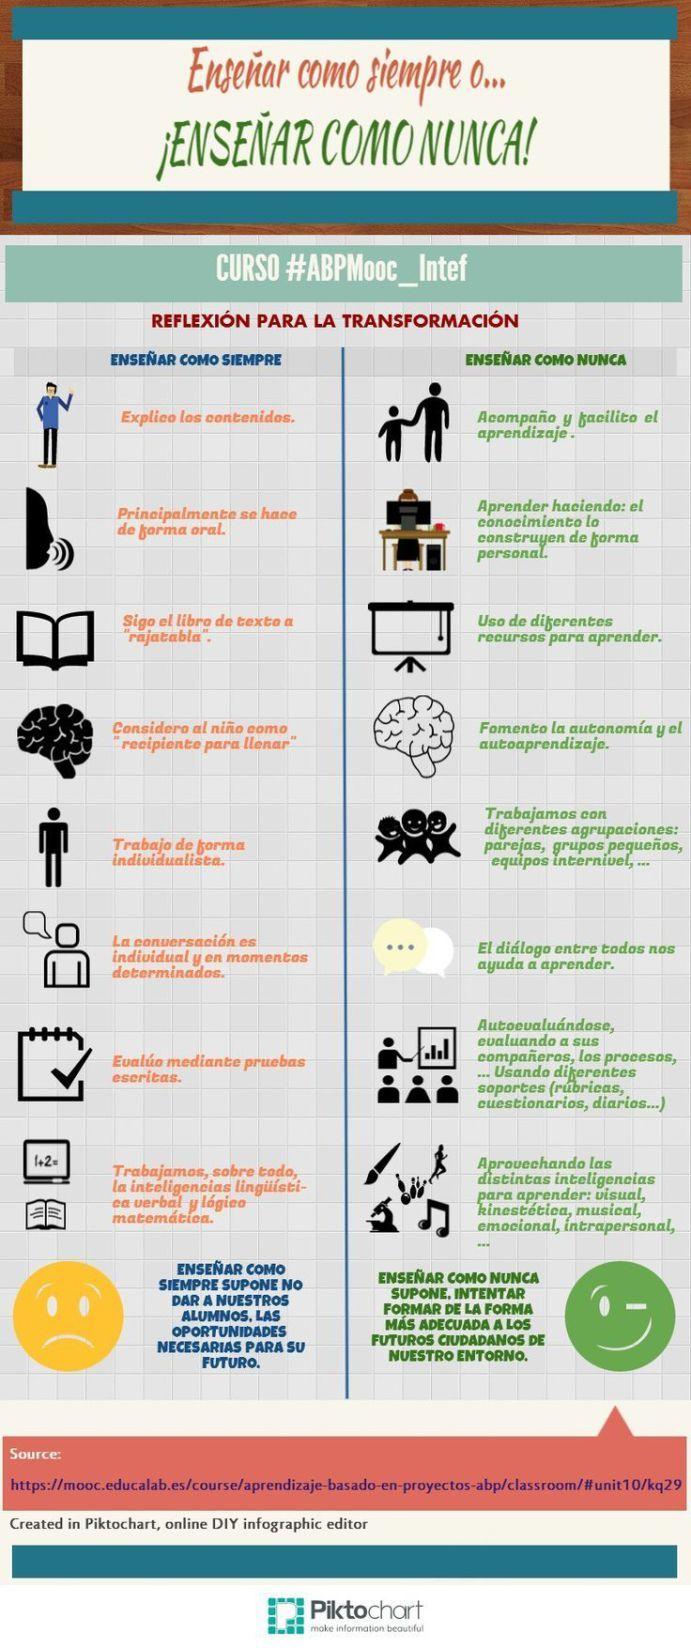 EnseñarComoSiempreVsEnseñarComoNunca-Infografía-BlogGesvin